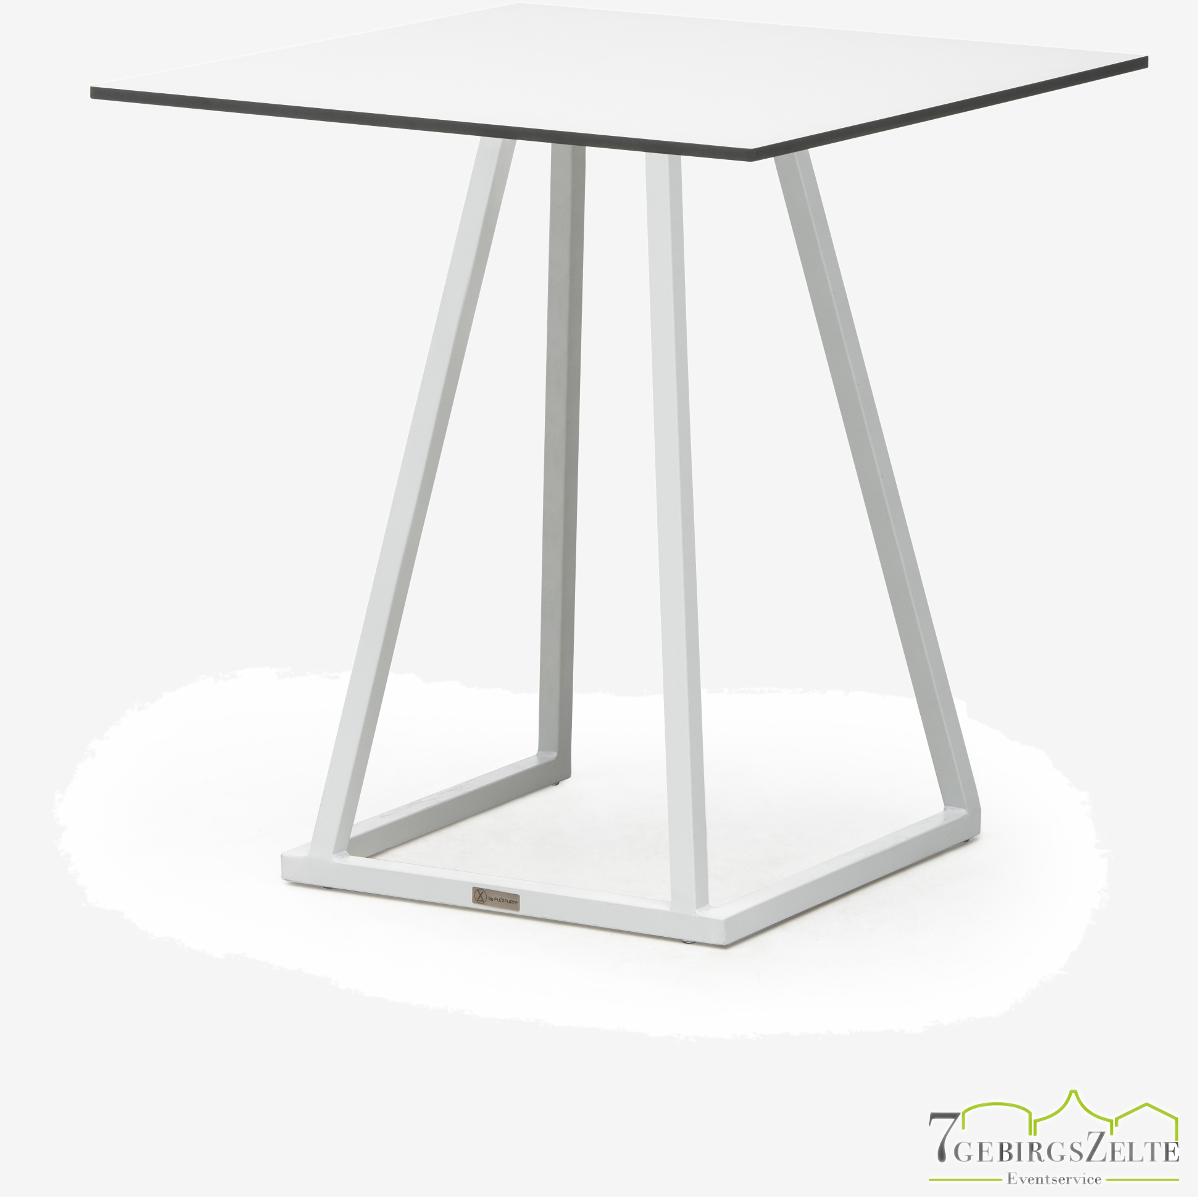 Linéa Lounge 70x70x40 - alu weiß  -Tischplatte Farbe: variabel